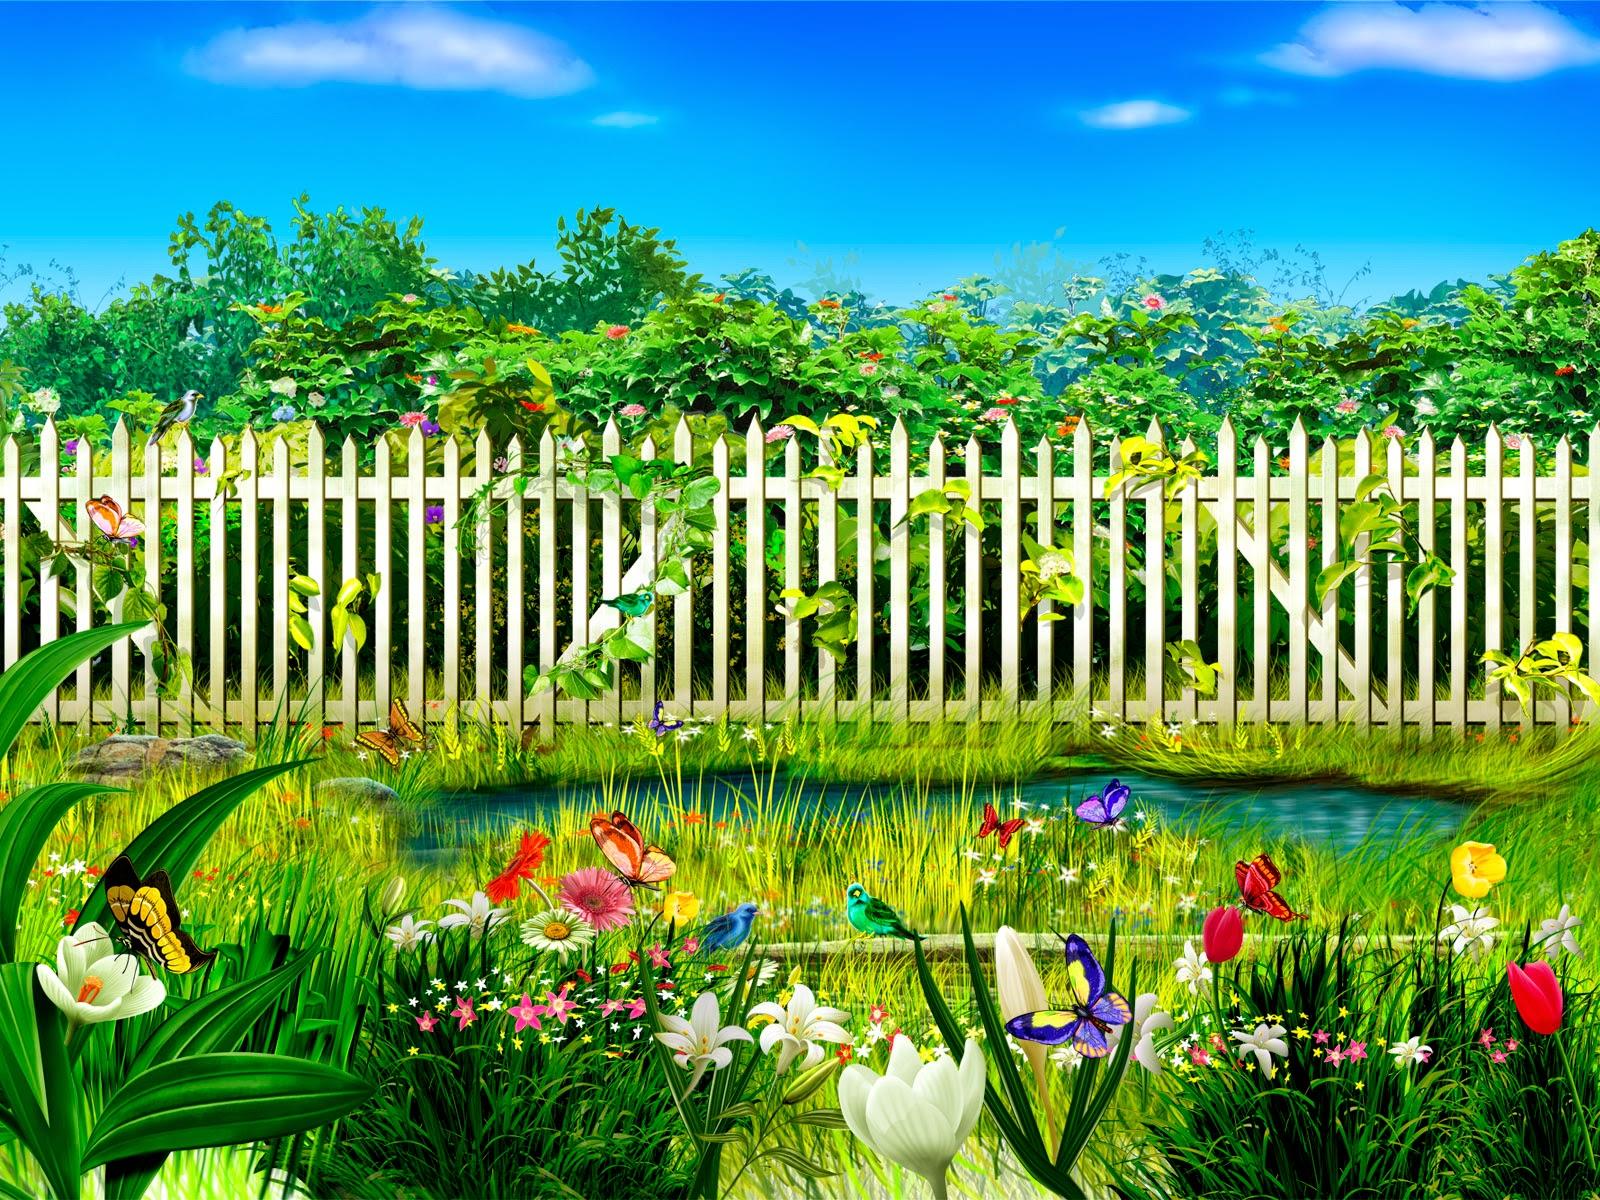 Flower Garden Wallpaper Downloadhttprefreshrose 1600x1200